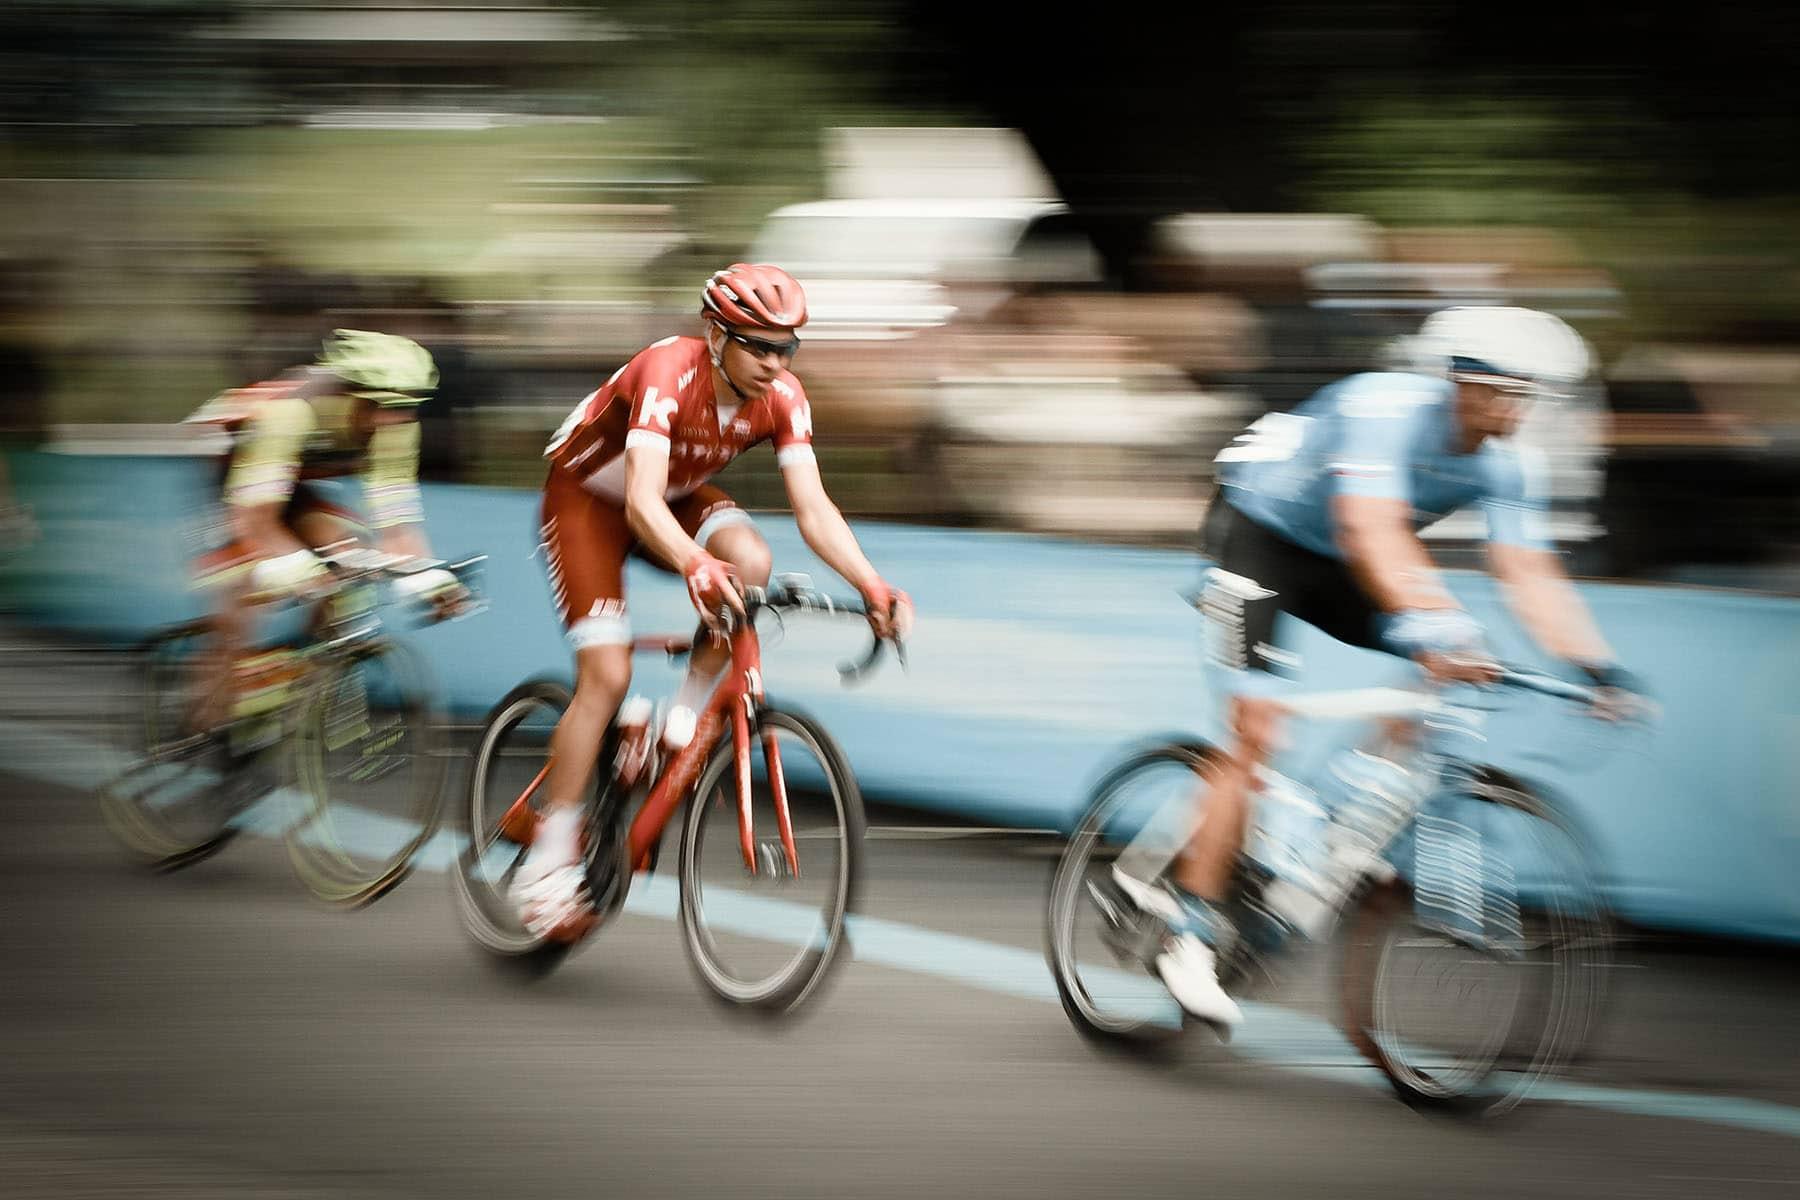 Three men racing on bicycles